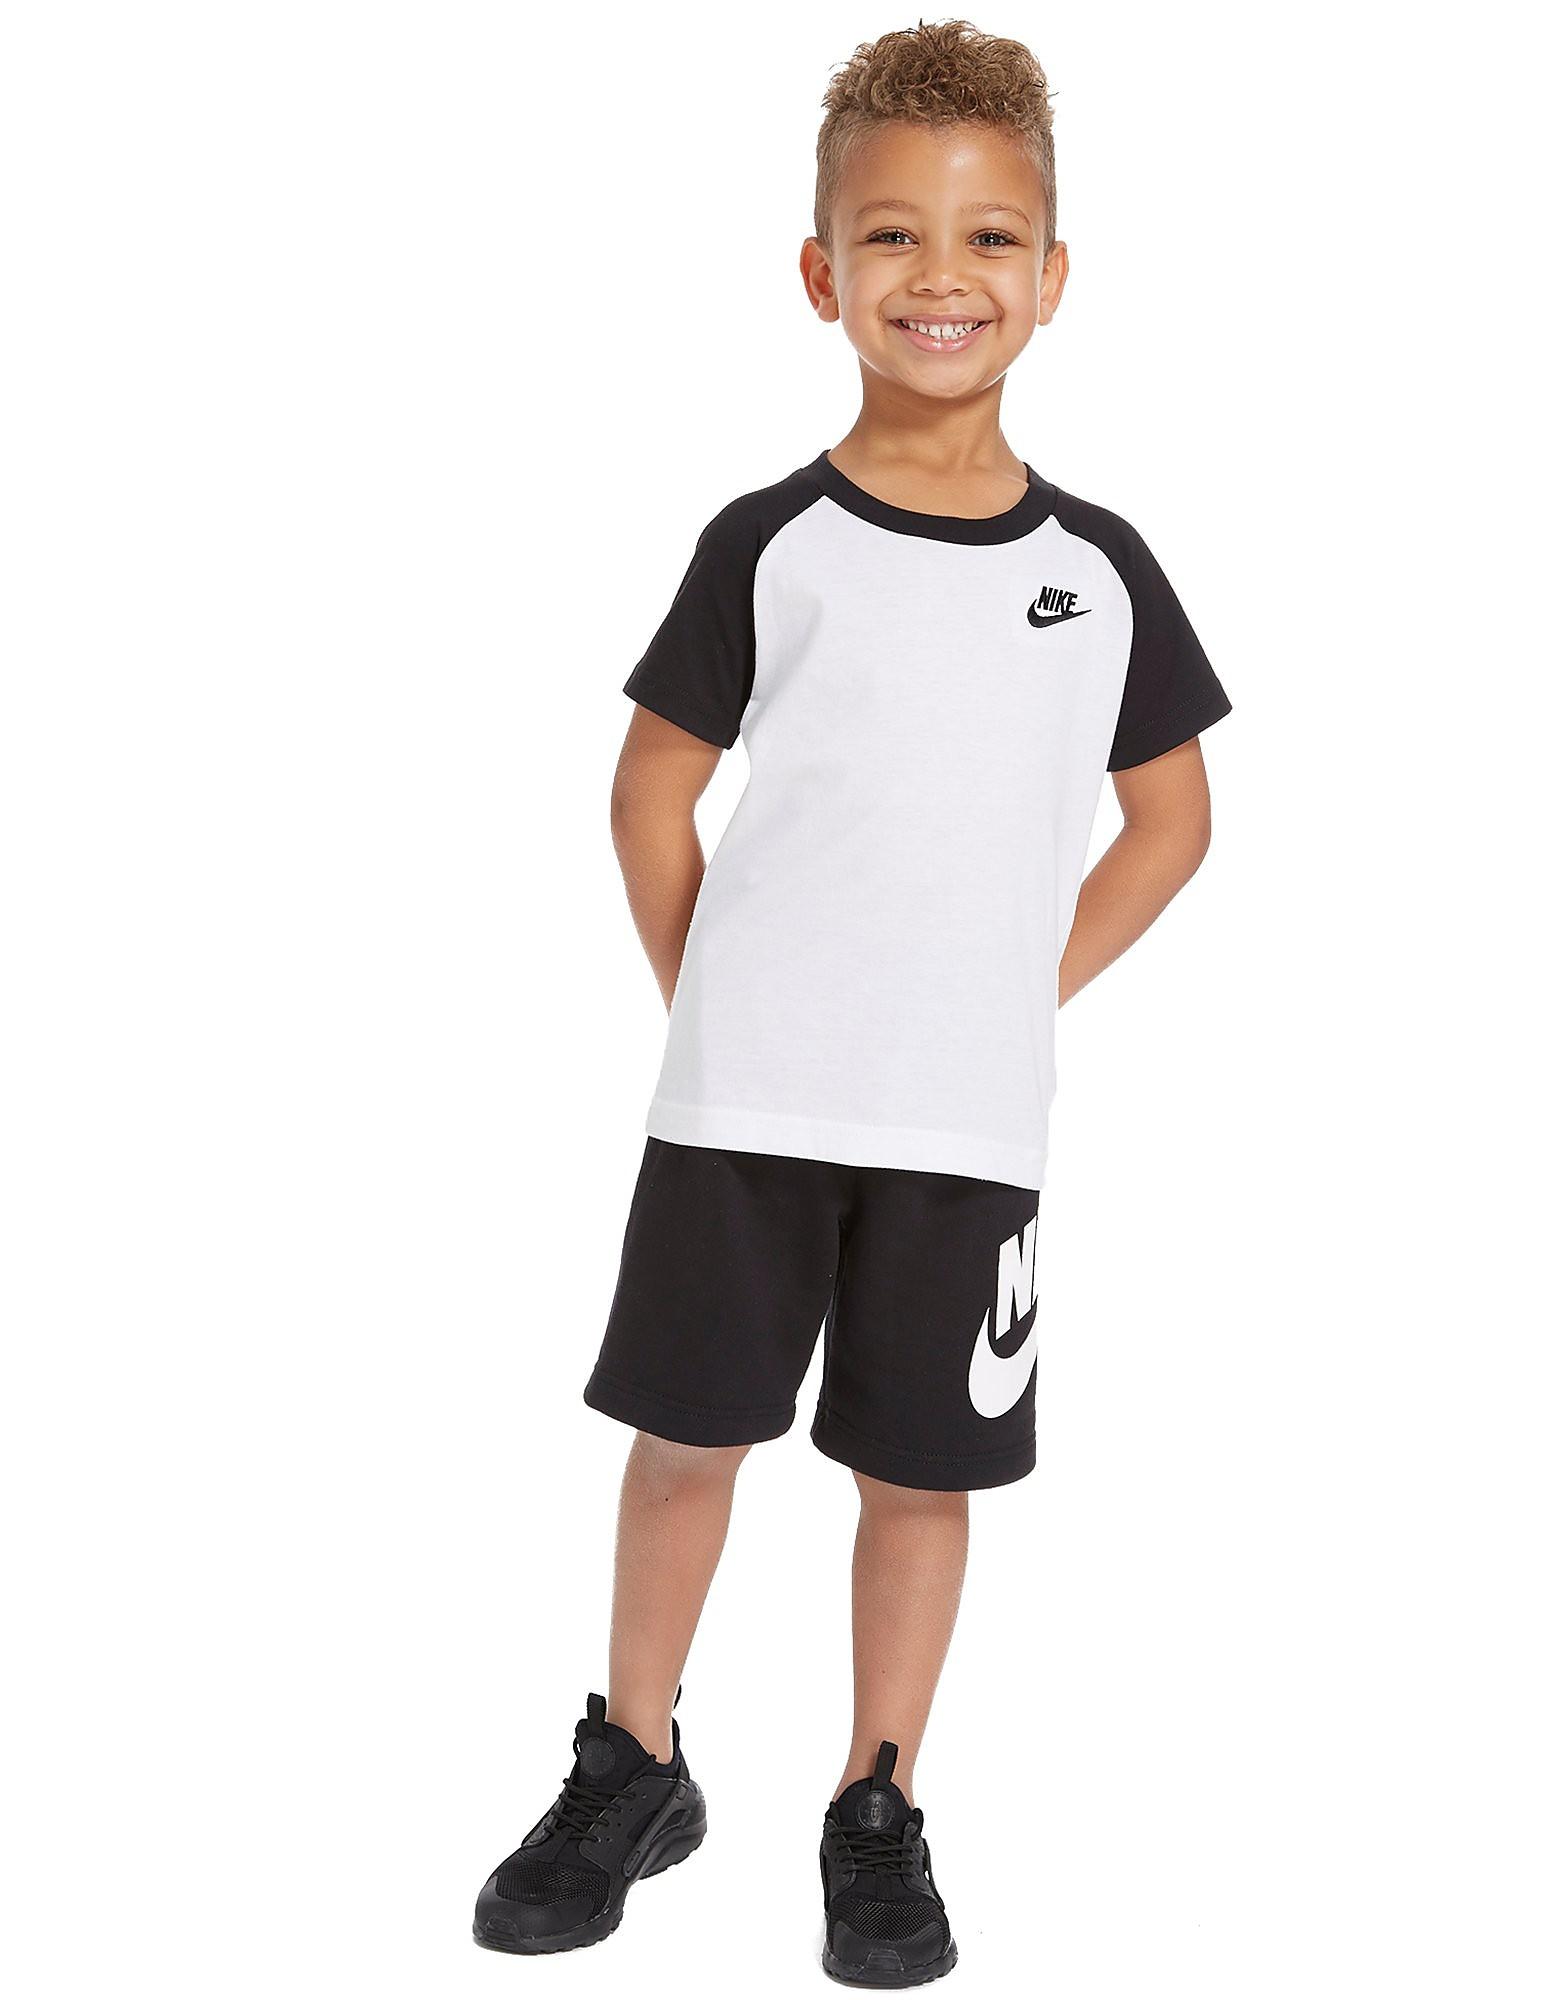 Nike Sportswear Raglan T-Shirt + Short Set Children